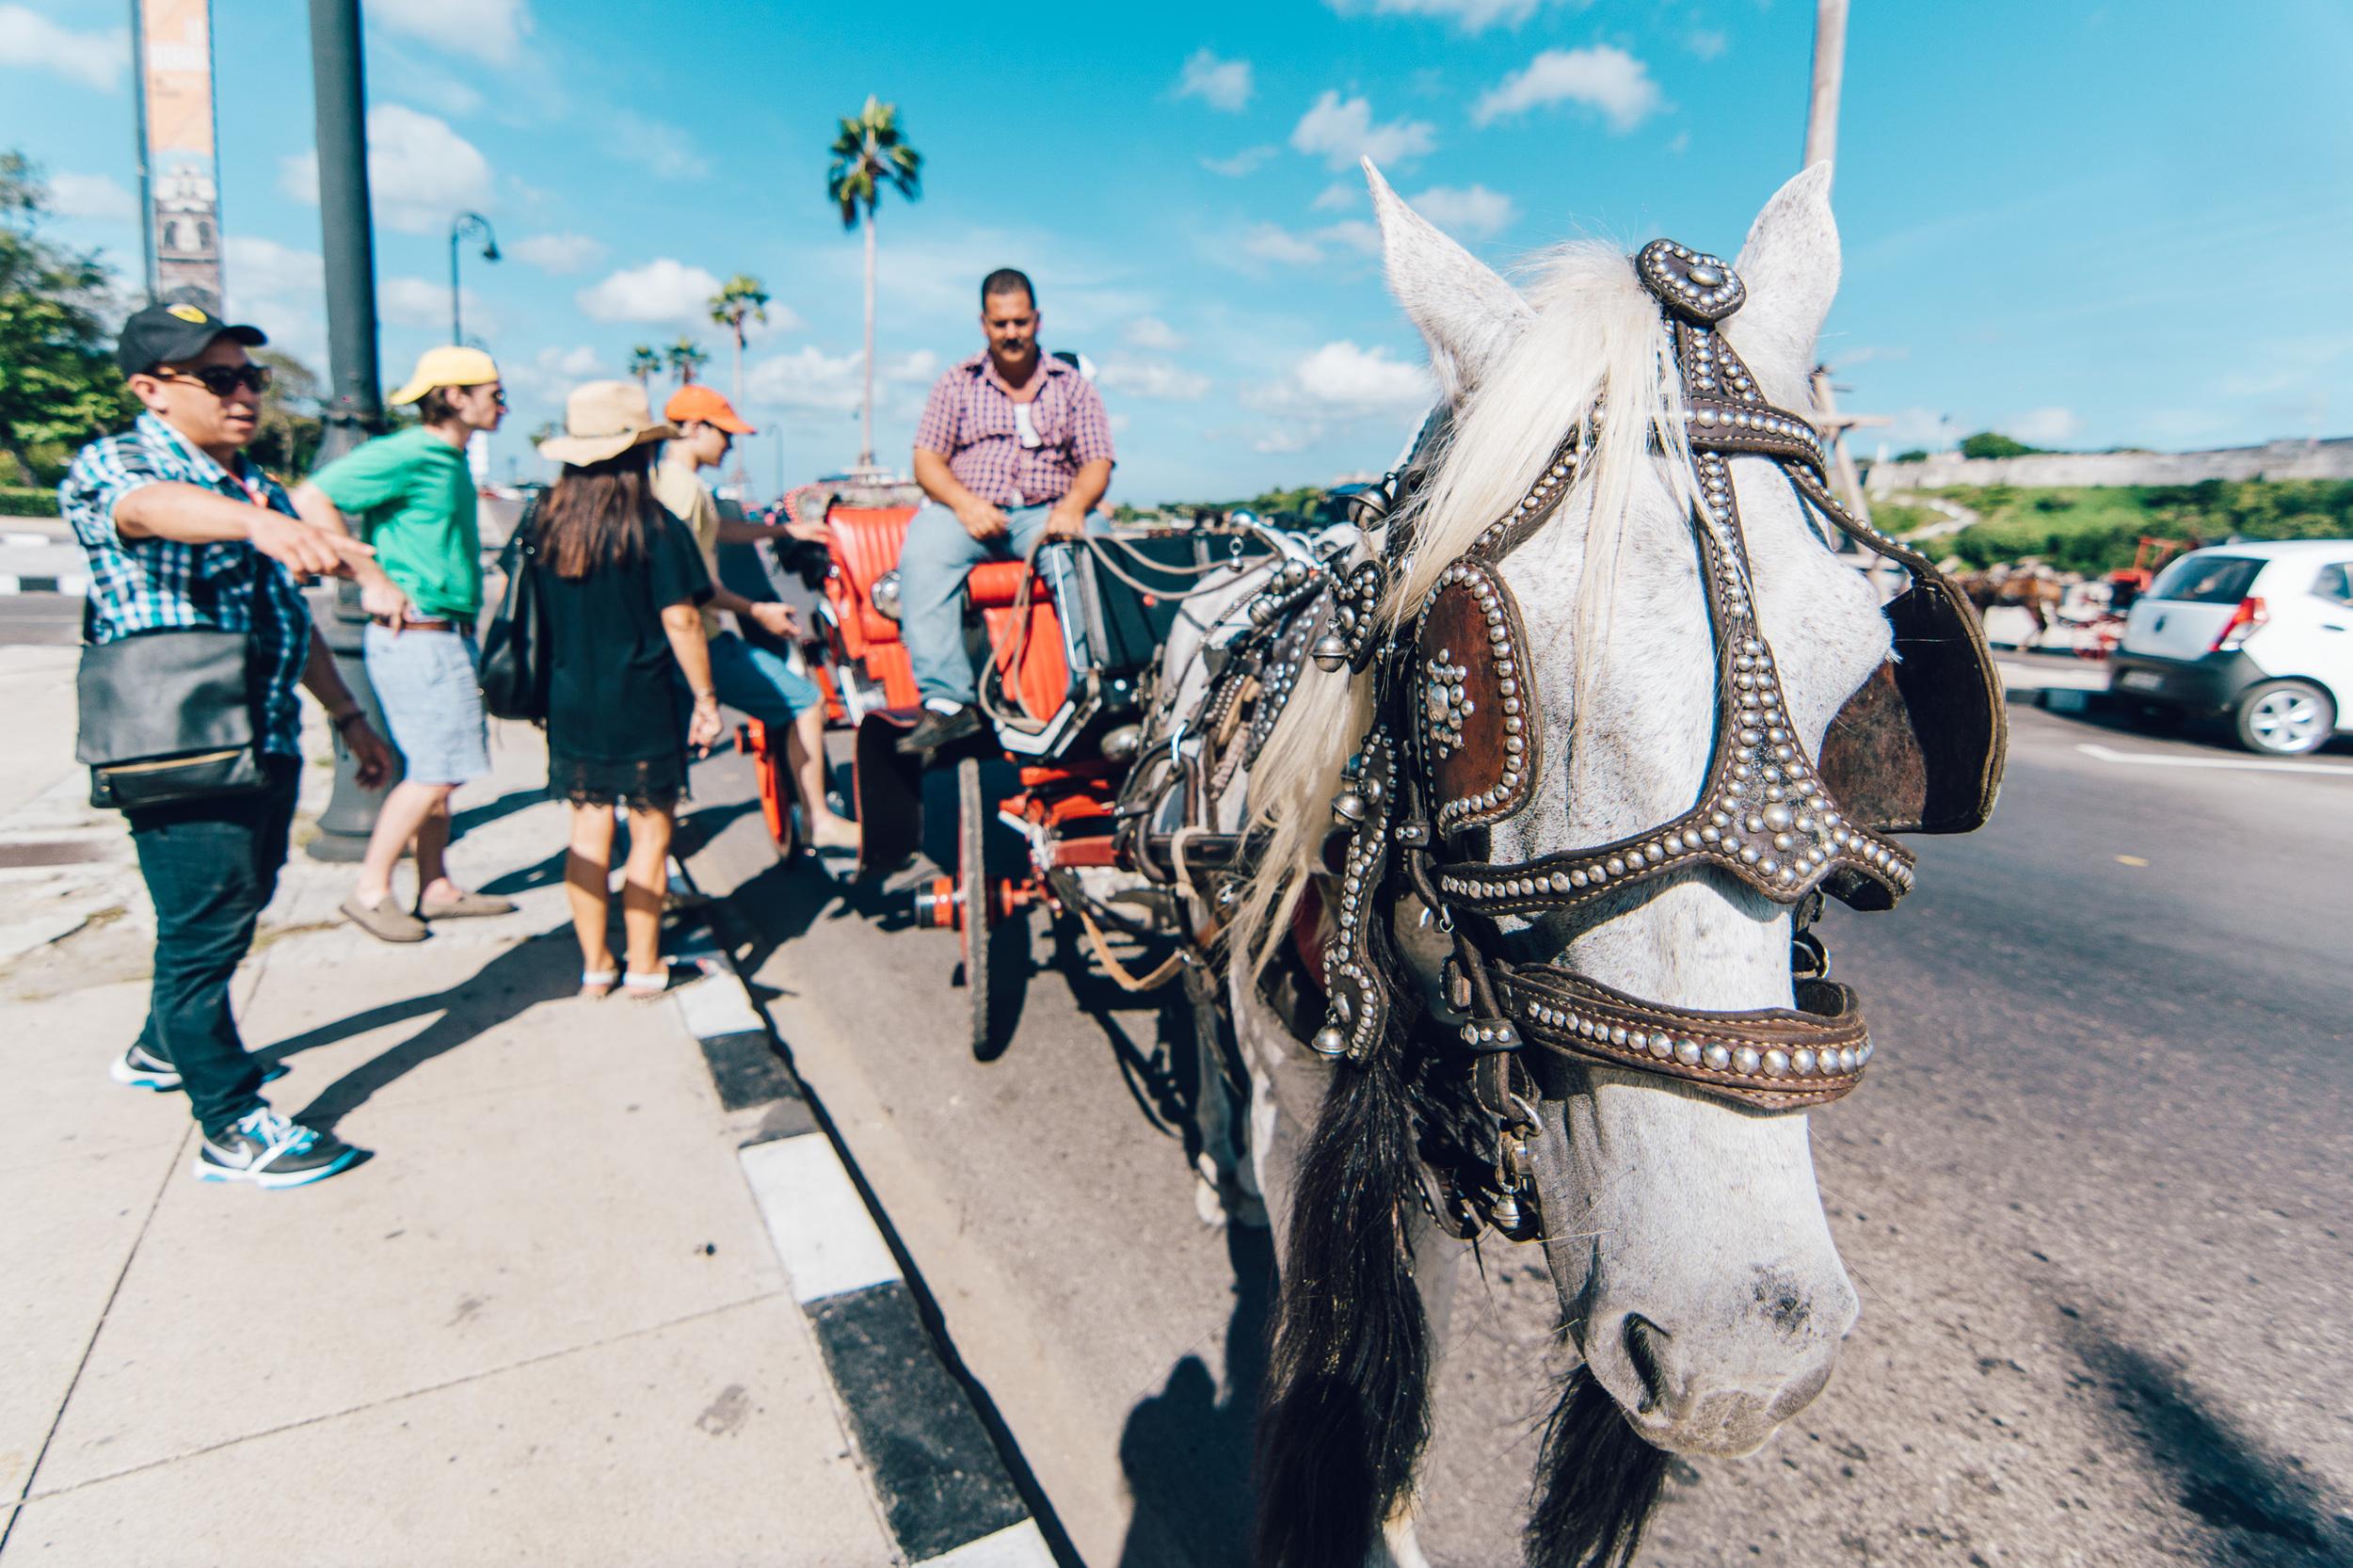 DeClaro-Photography-Cuba-02288.jpg